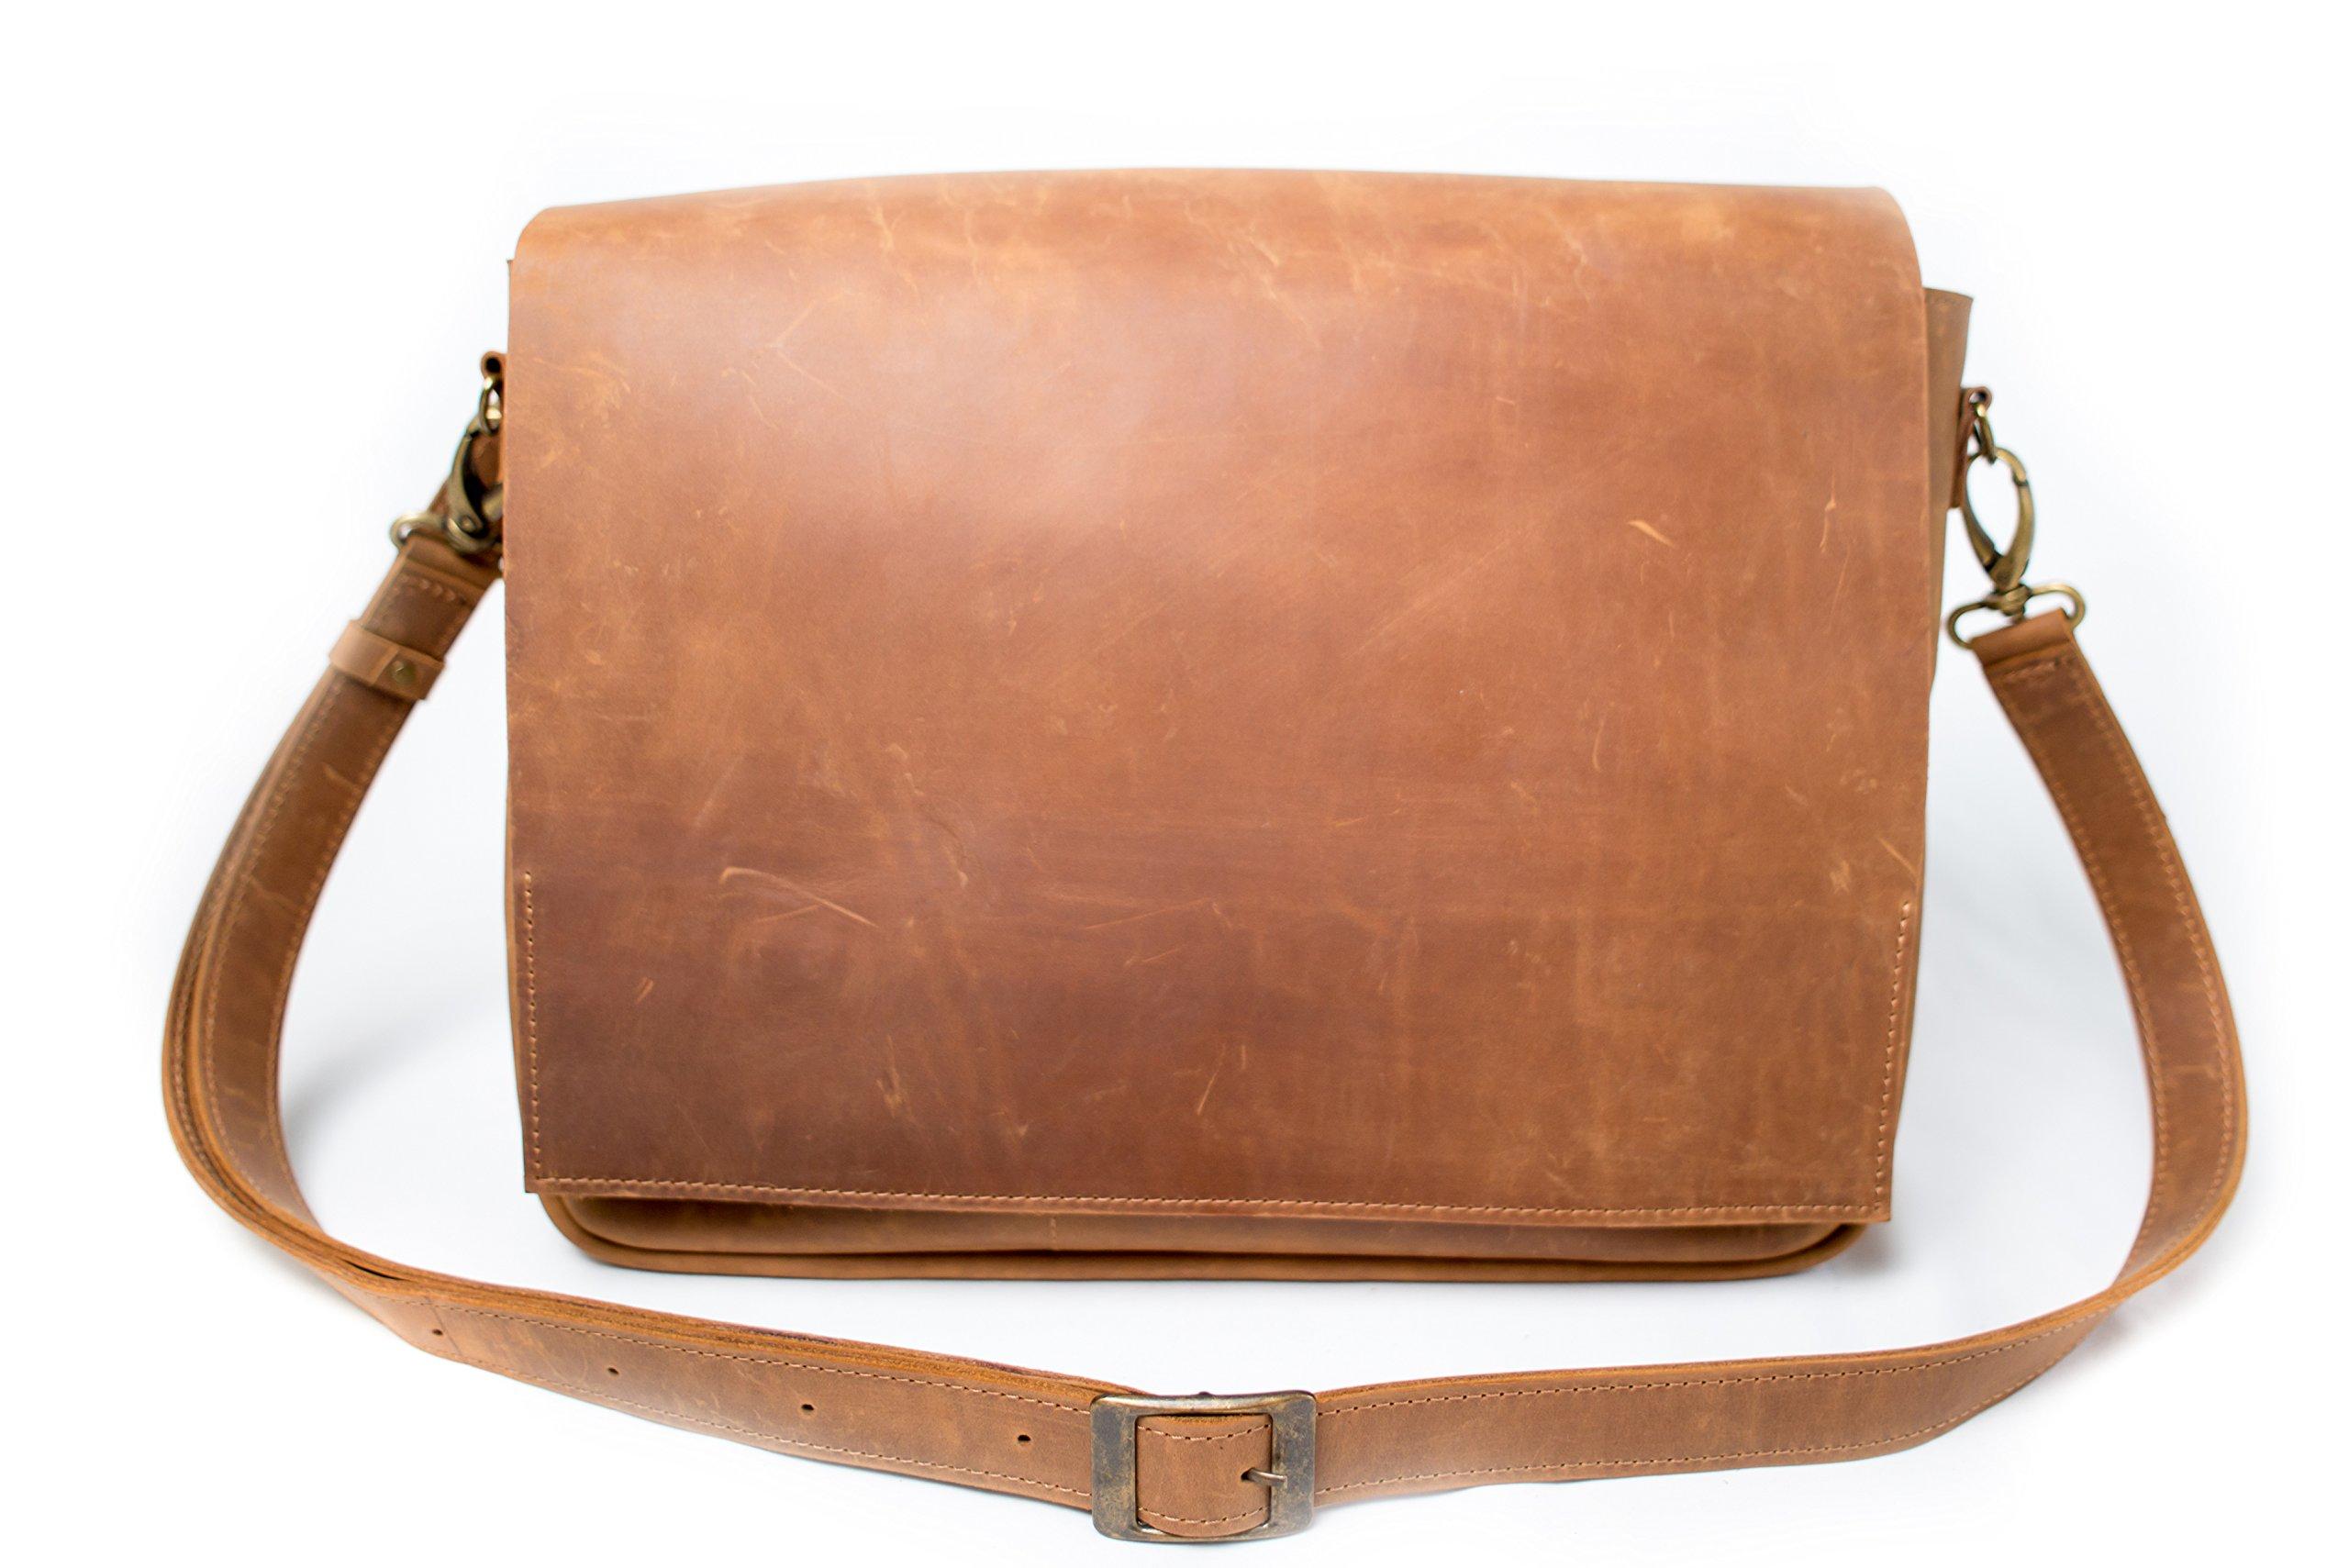 InCarne Messenger bag for men leather business casual (Light Brown)